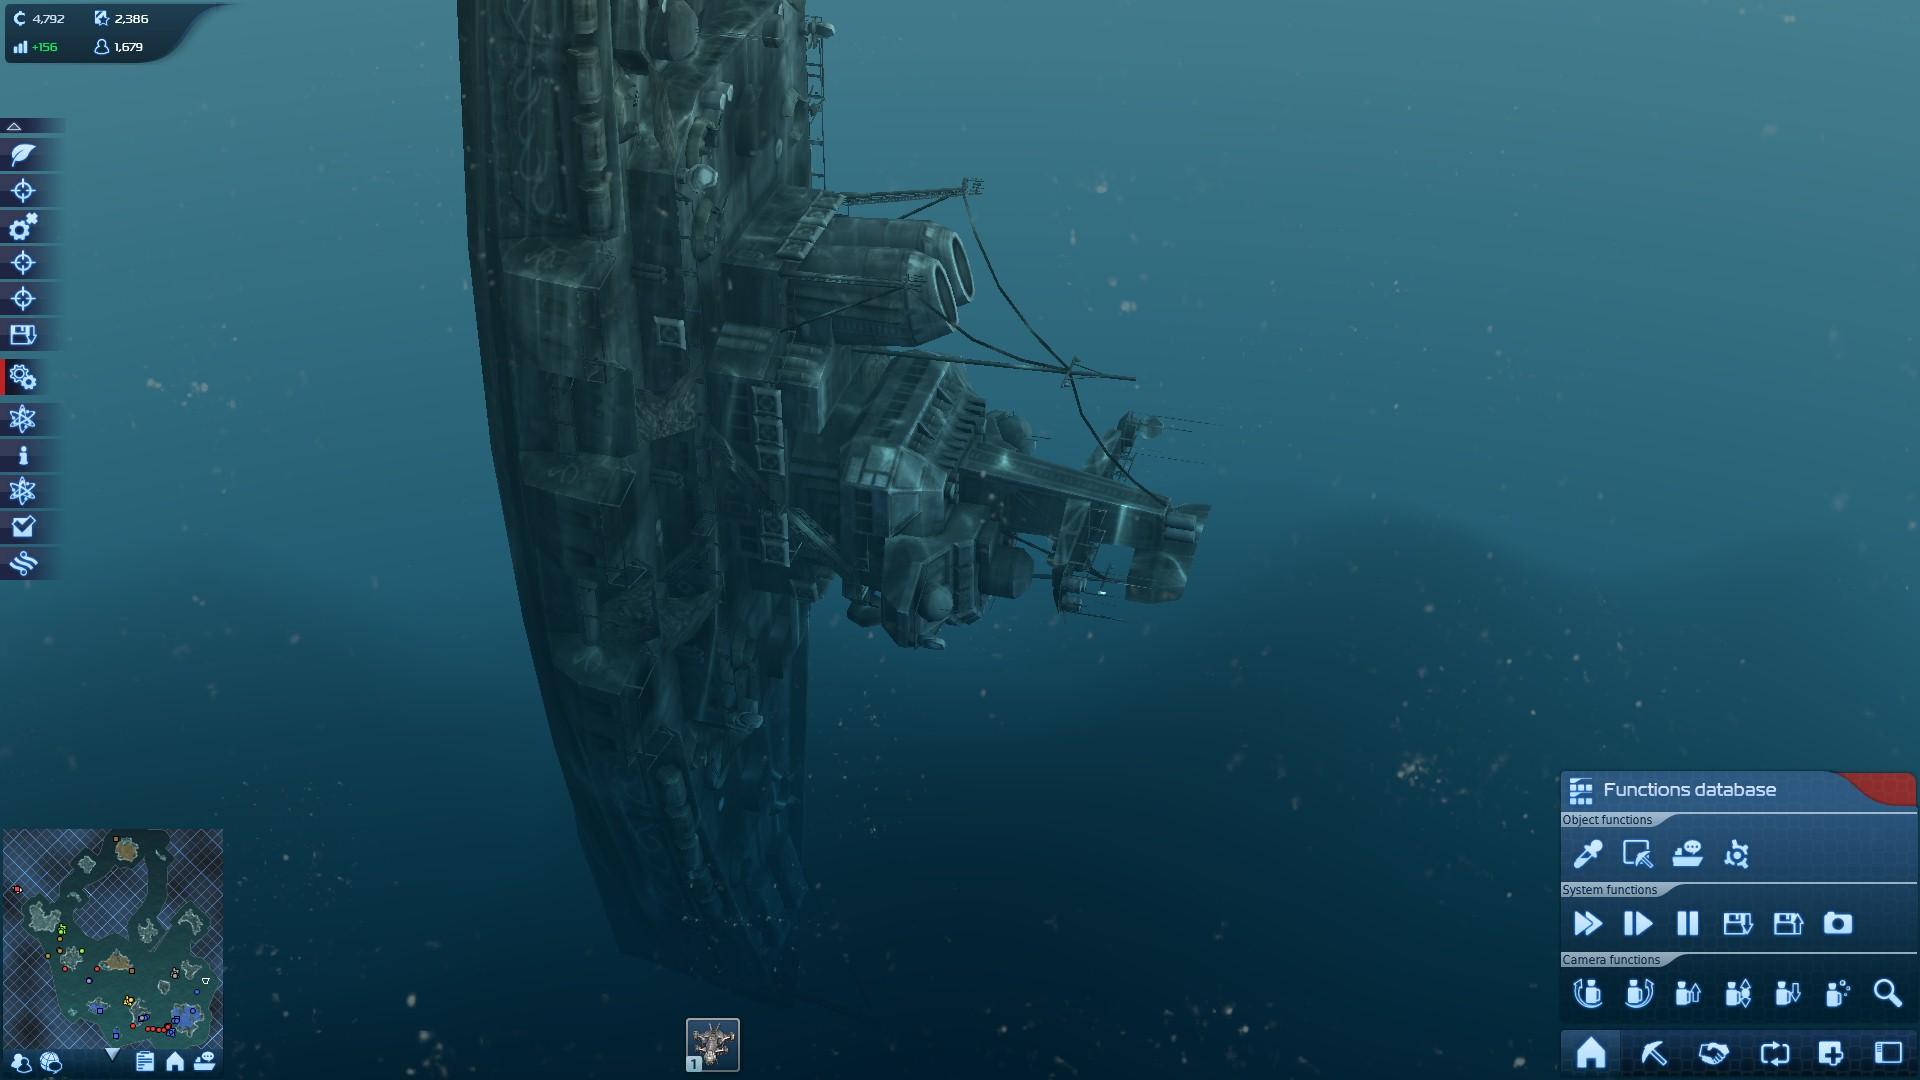 Image Keto Sinking Ship Jpg Anno 2070 Wiki